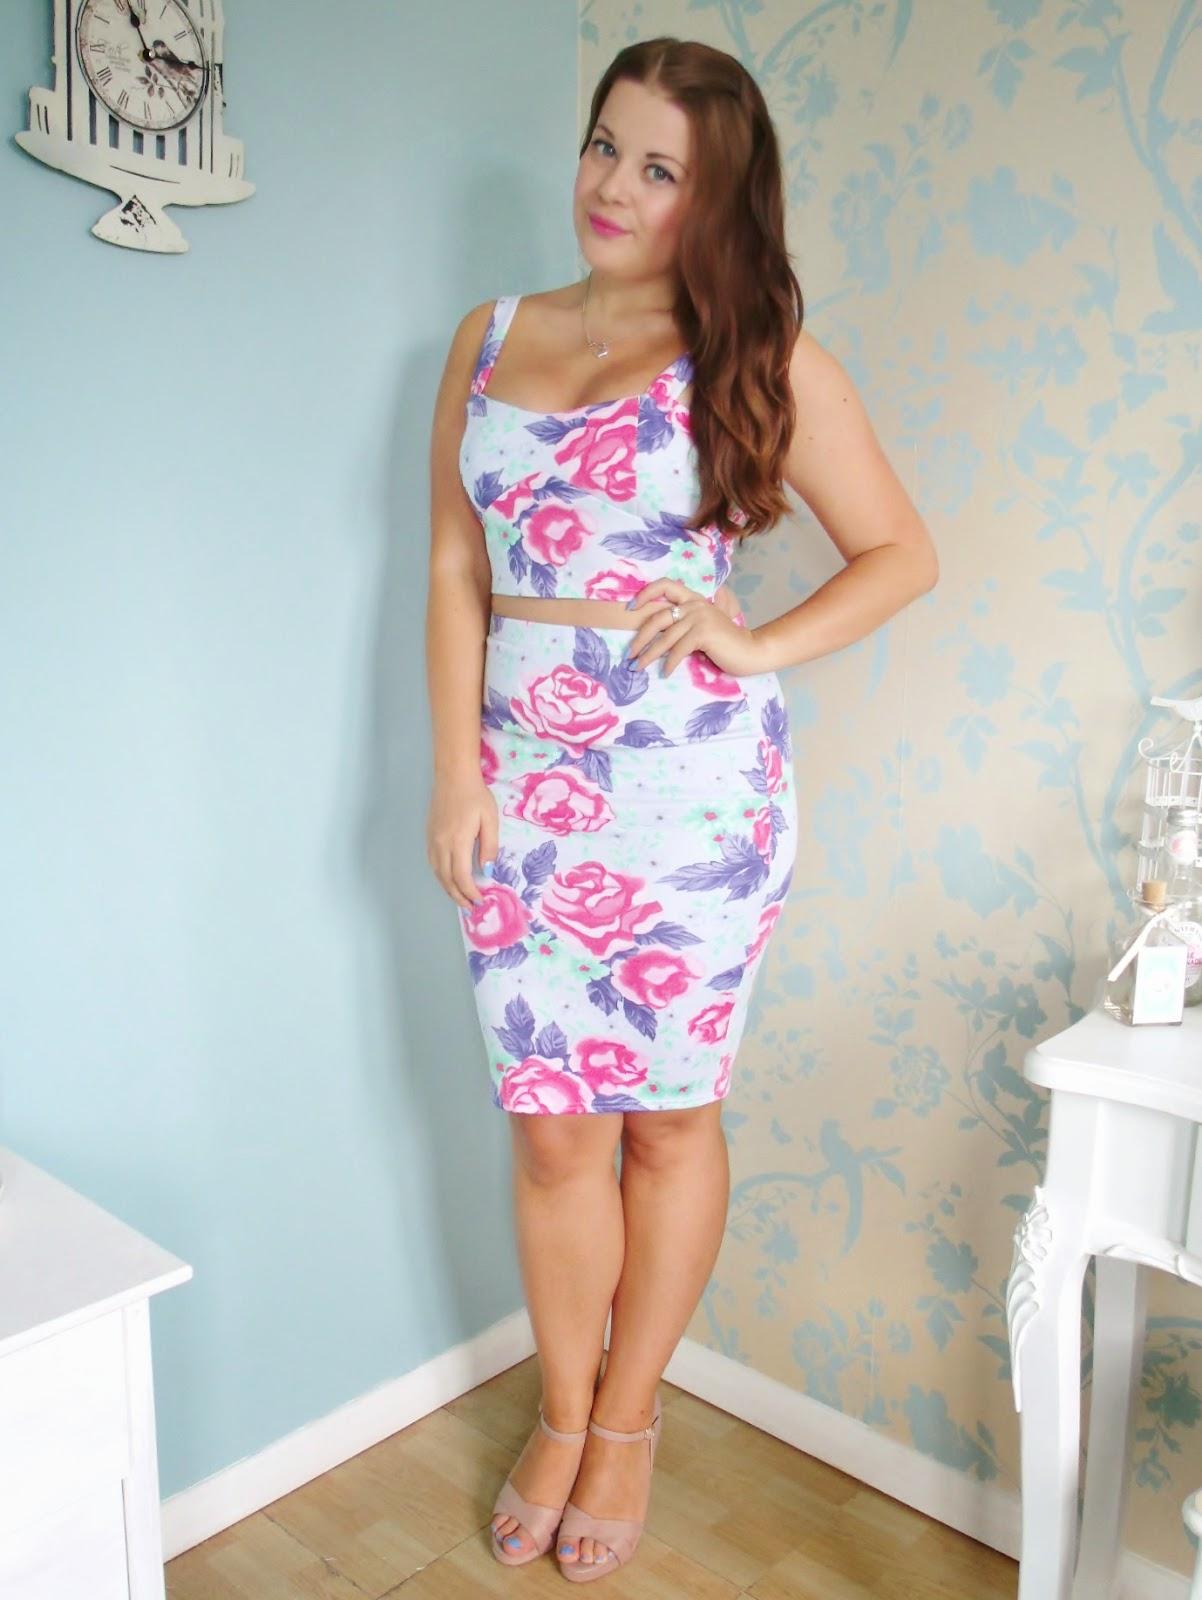 Bralet Amp Pencil Skirt Floral Coord Amp Laurens Way Tan